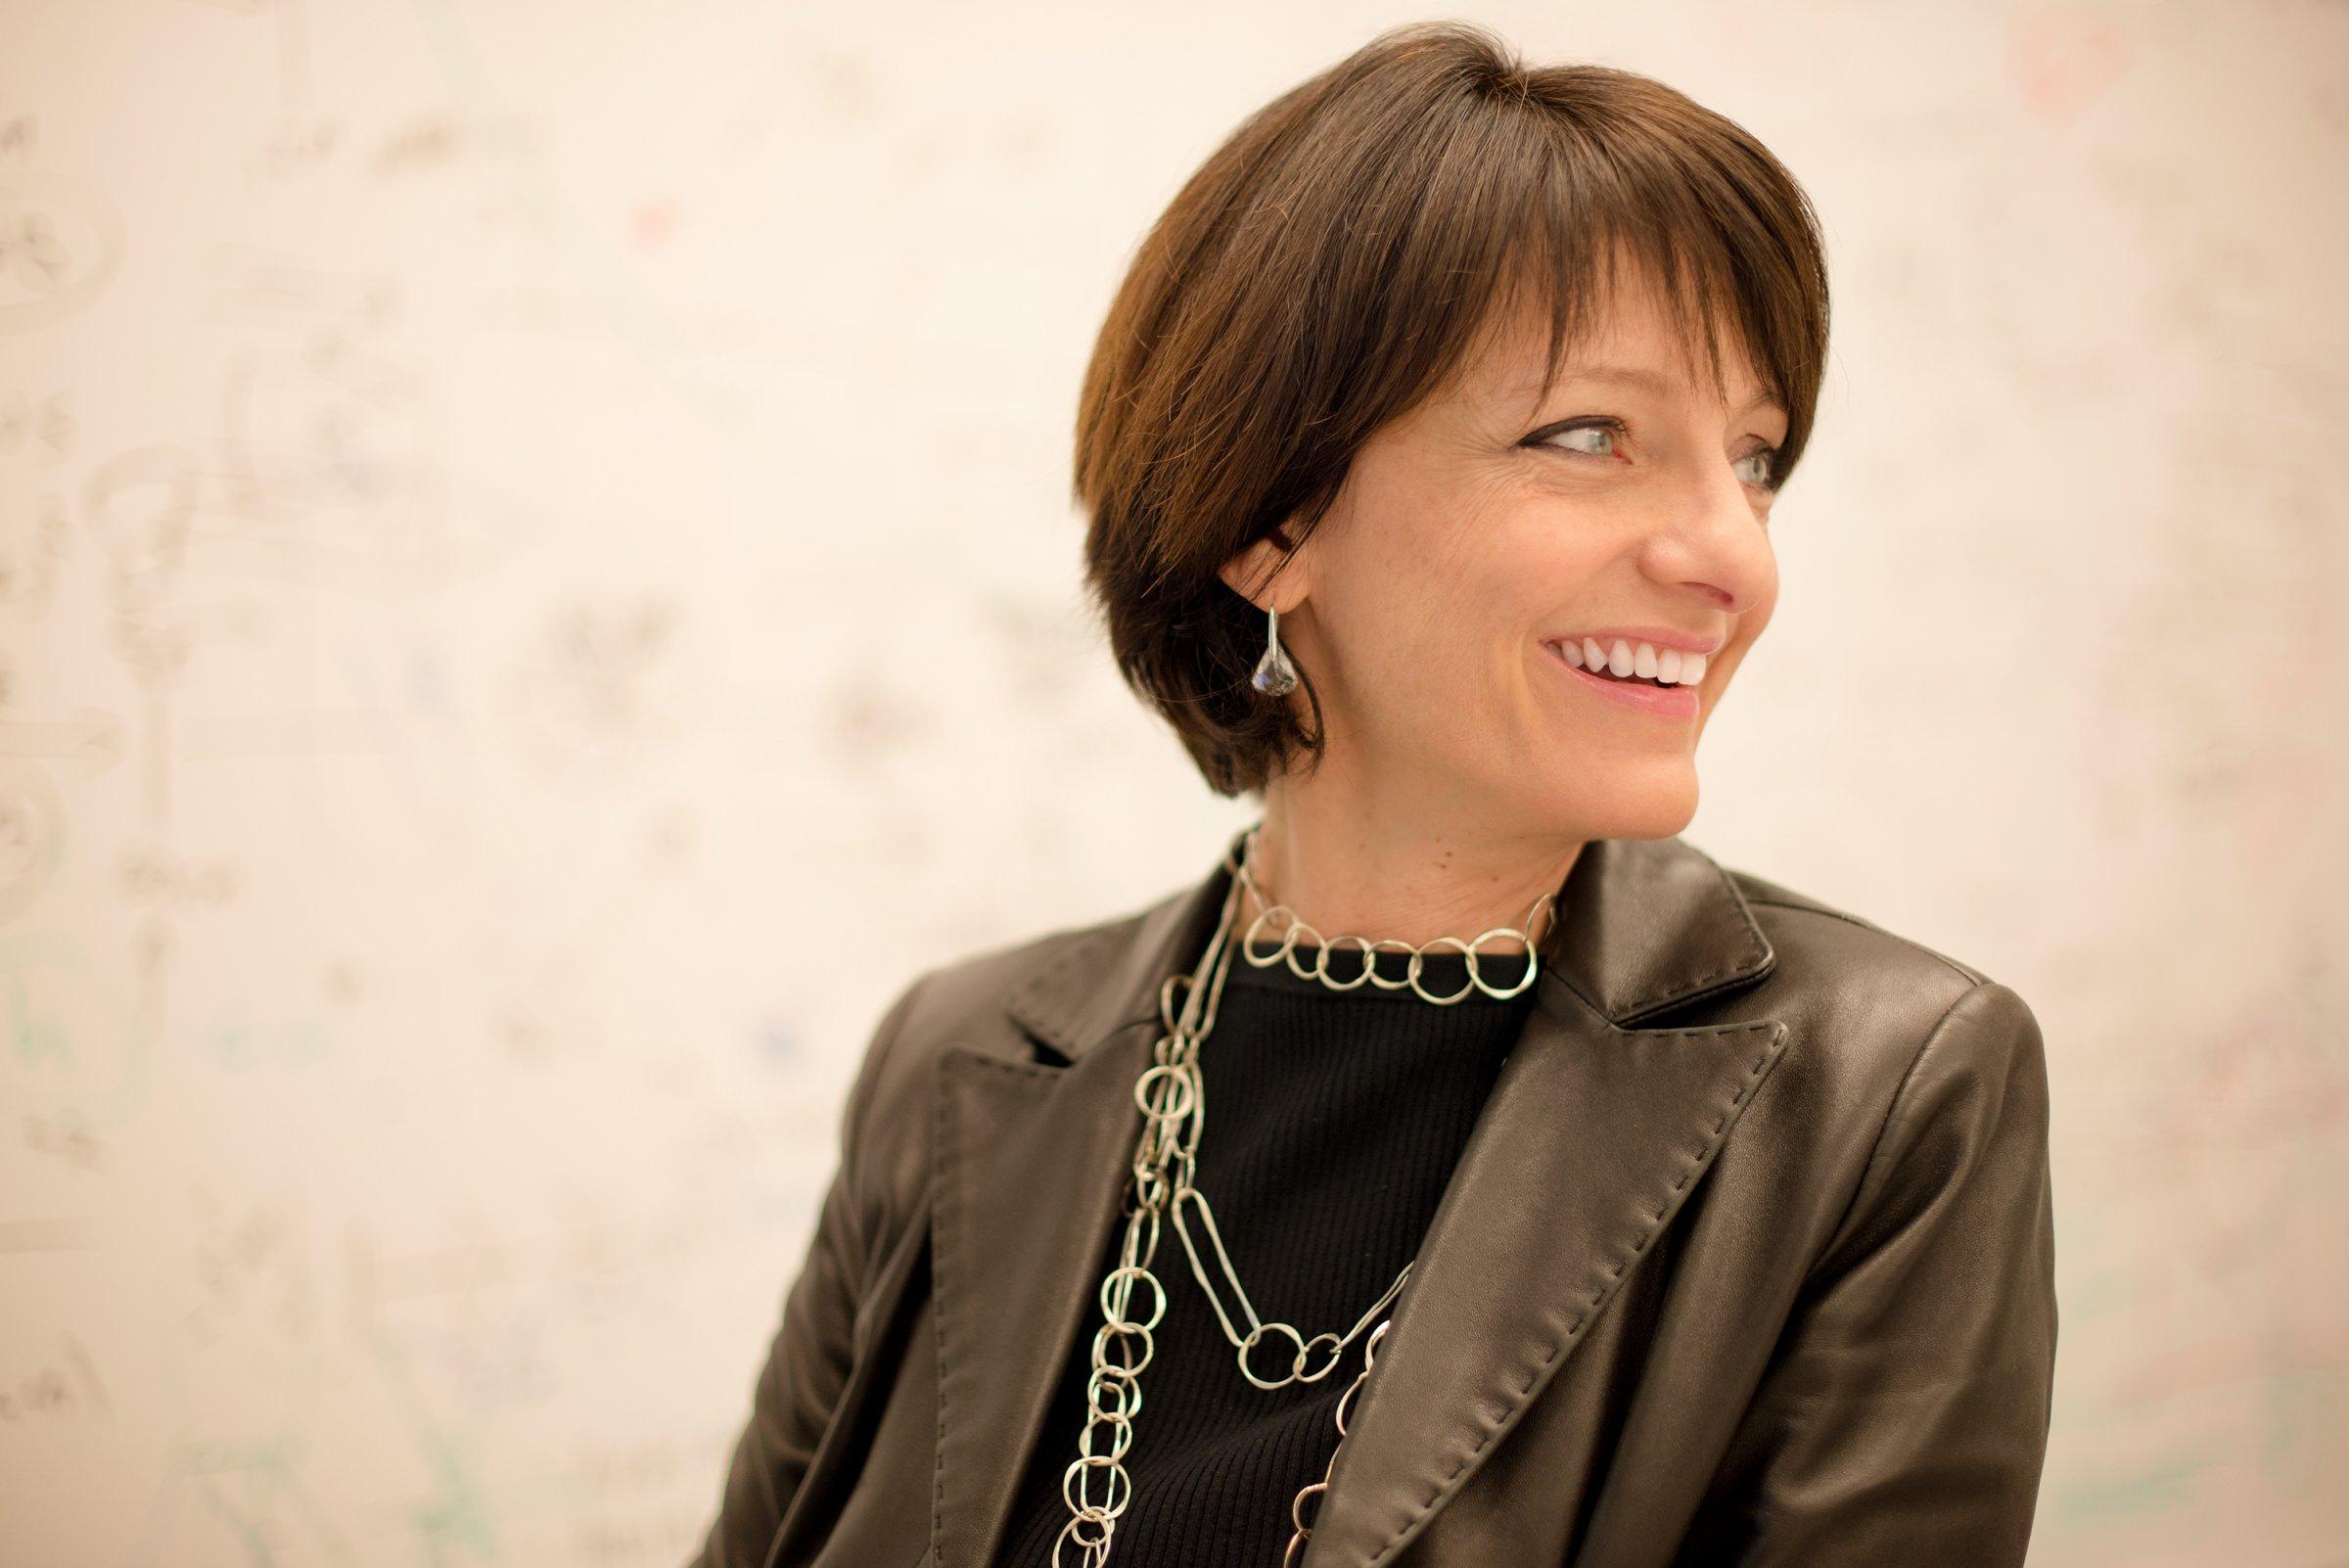 Regina Dugan。图片来源/businessinsider.com